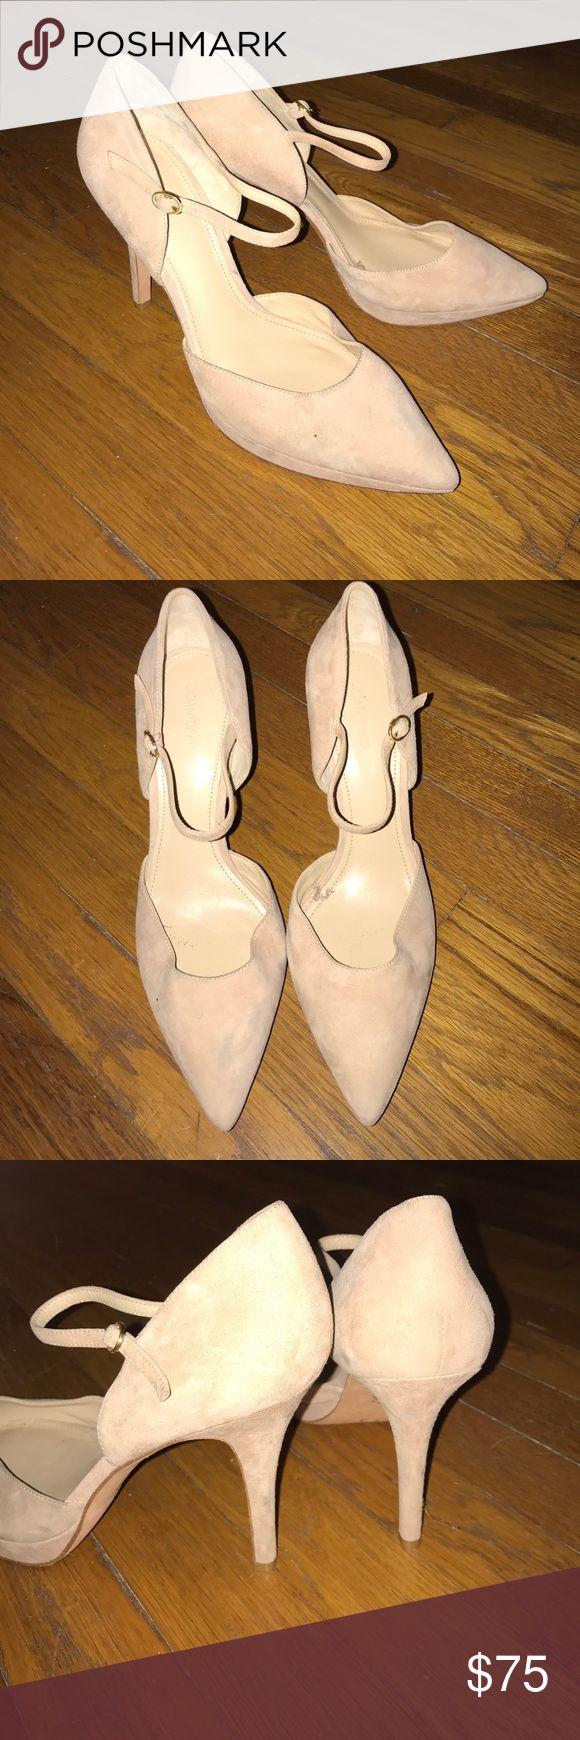 Nude Joan & David, Heels Nude heels, with single strap. Slightly worn but still in good condition. Joan & David Shoes Heels